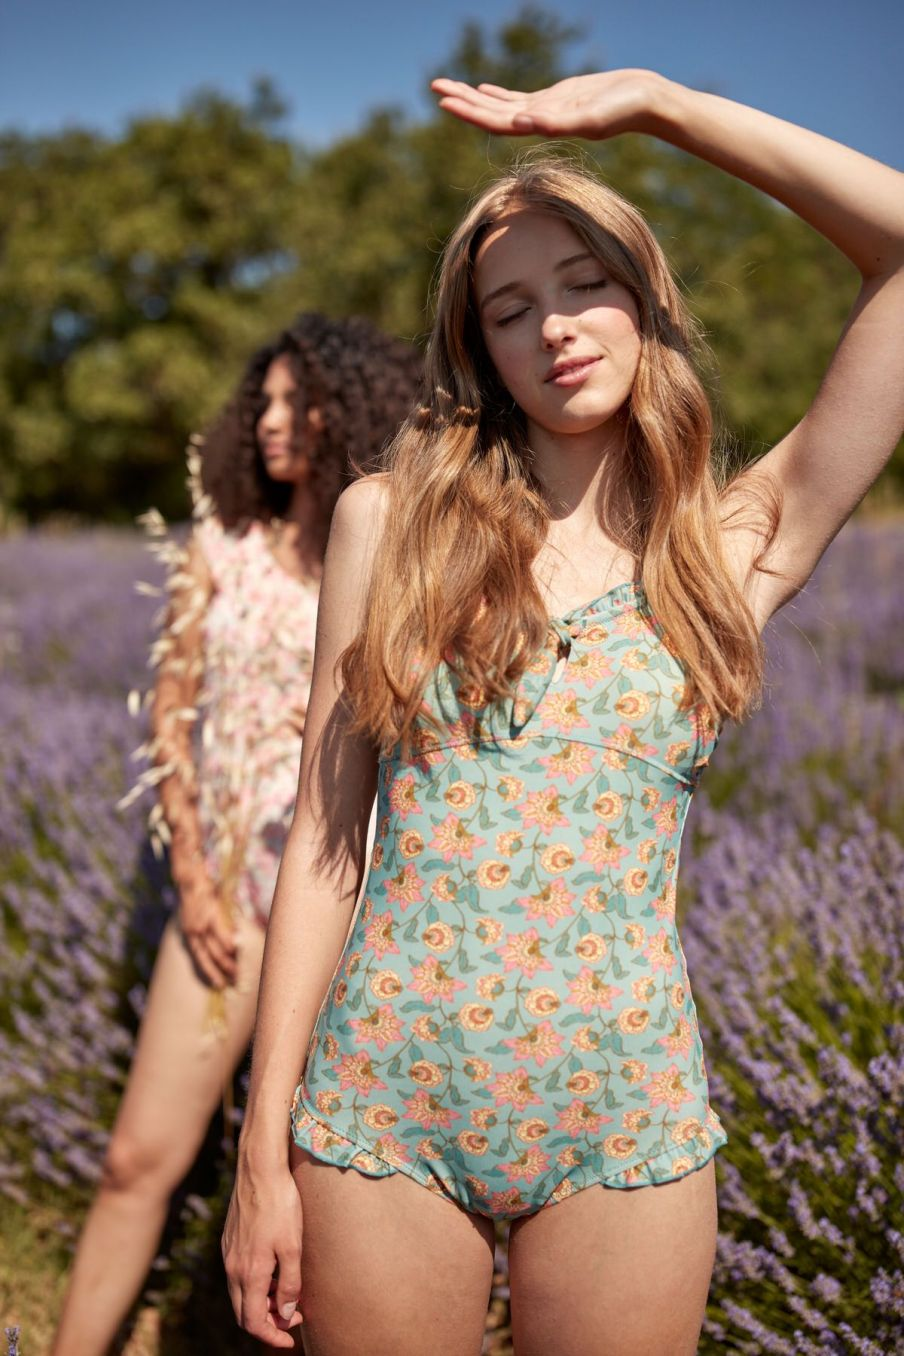 boheme chic vintage maillot de bain femme bayo turquoise flowers